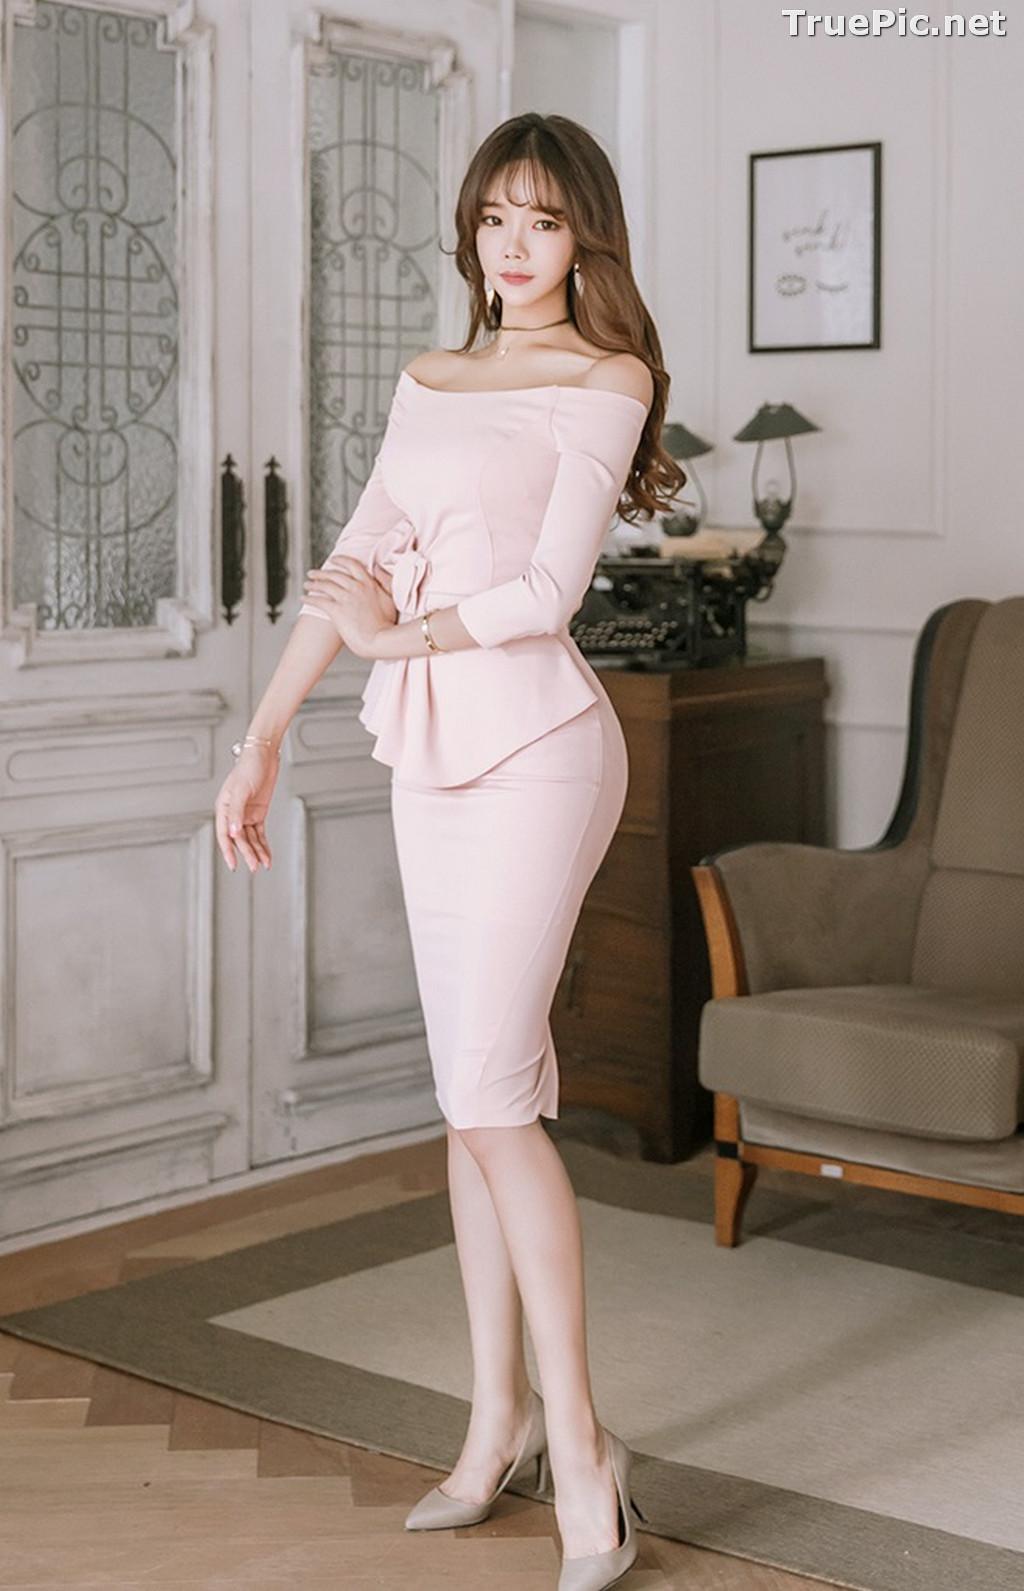 Image Korean Fashion Model - Kang Eun Wook - Slim Fit Bodycon Dress - TruePic.net - Picture-7